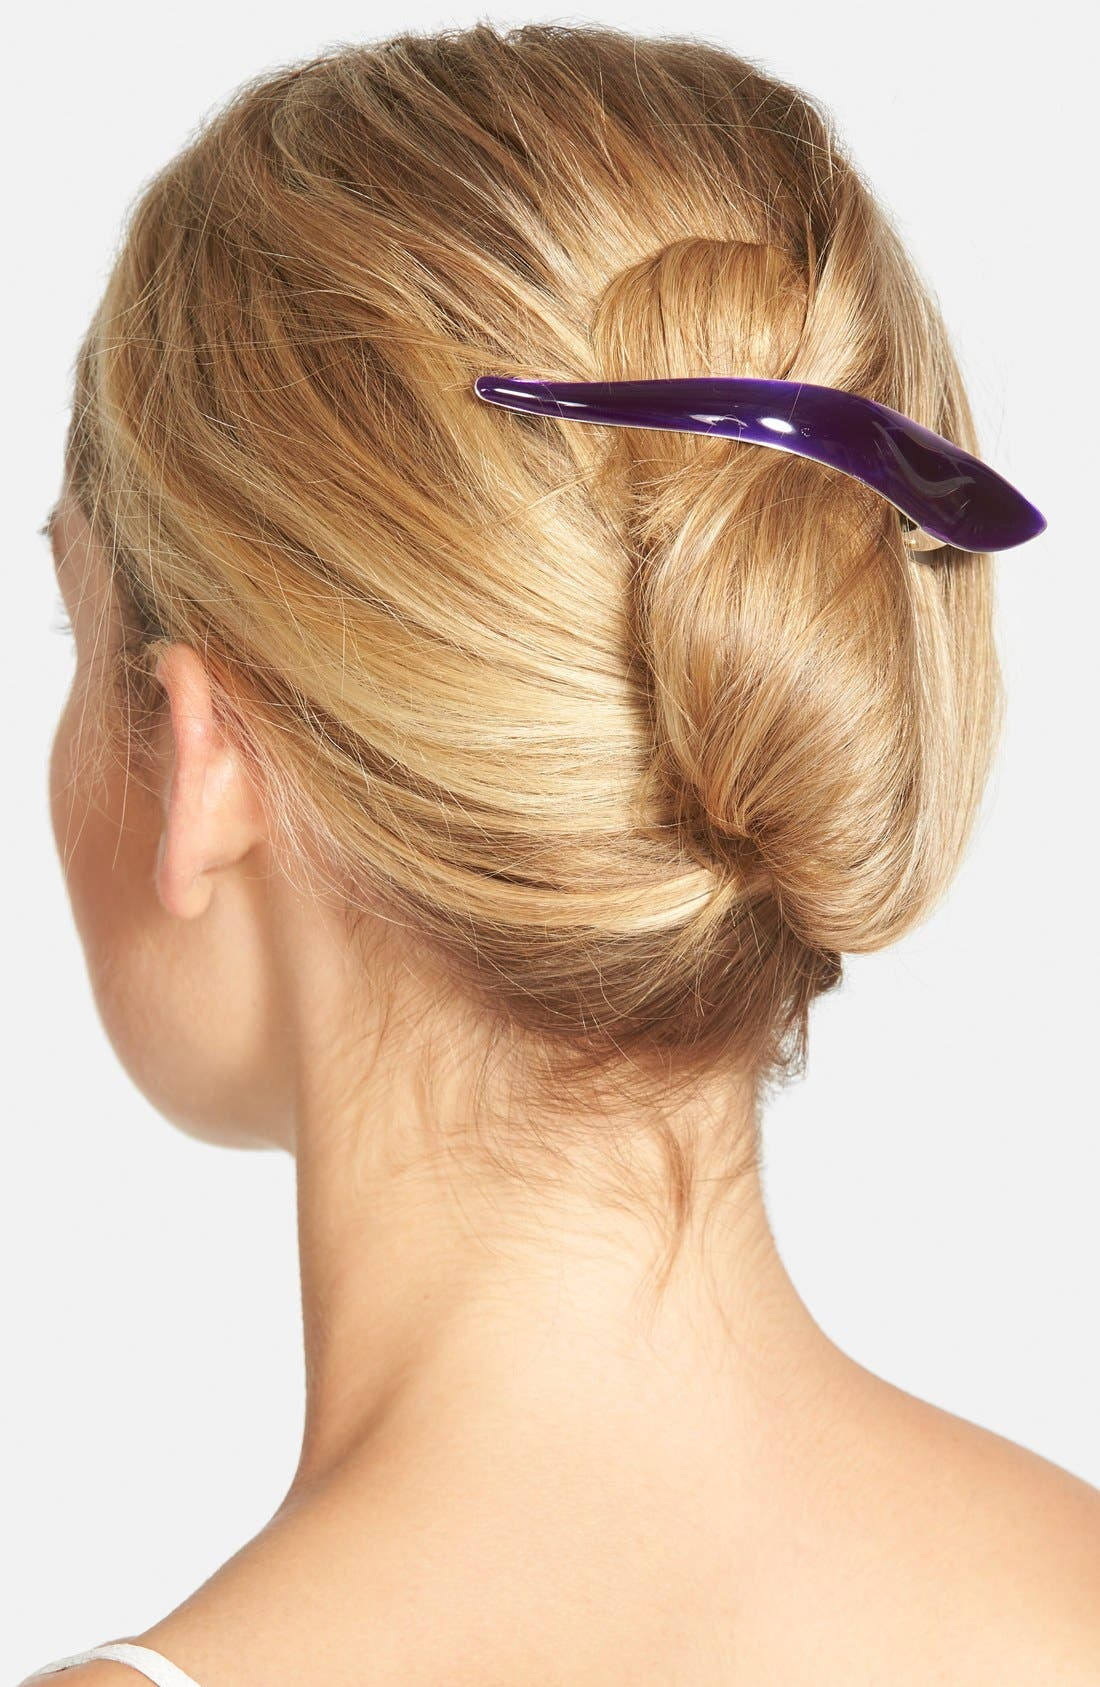 FICCARE Maximus Hair Clip